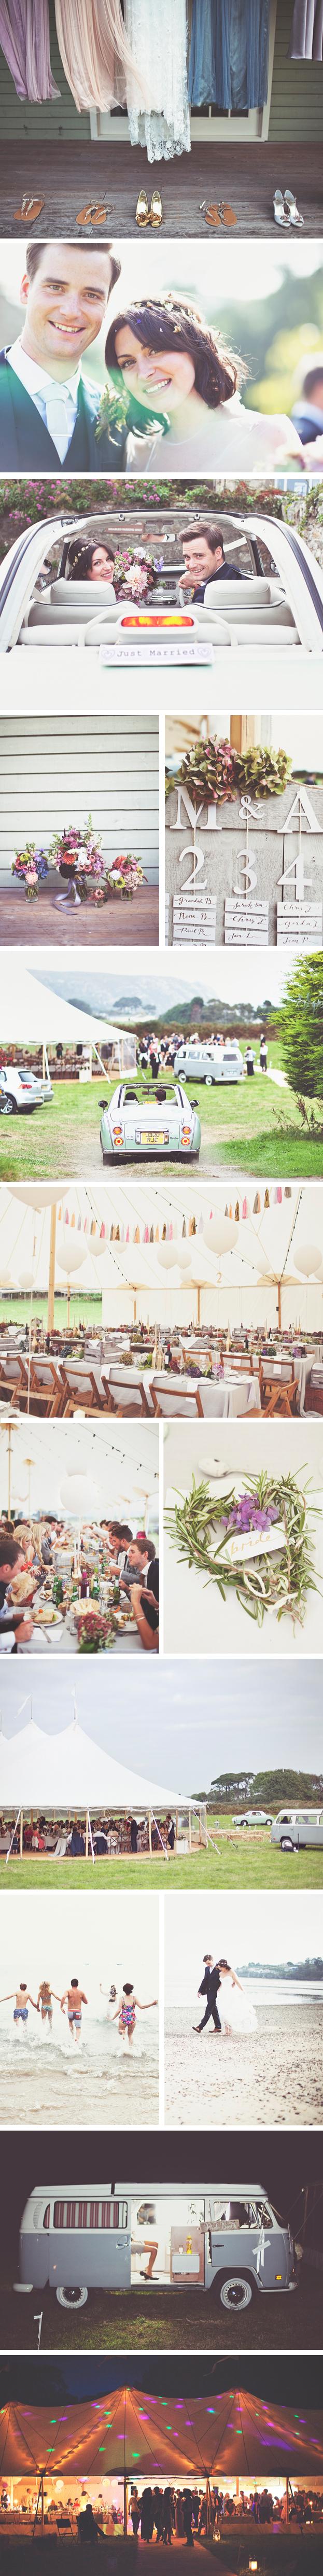 Alex & Matt PapaKata Sperry Wedding Fach Farm Caravan Park, Abersoch, North Wales